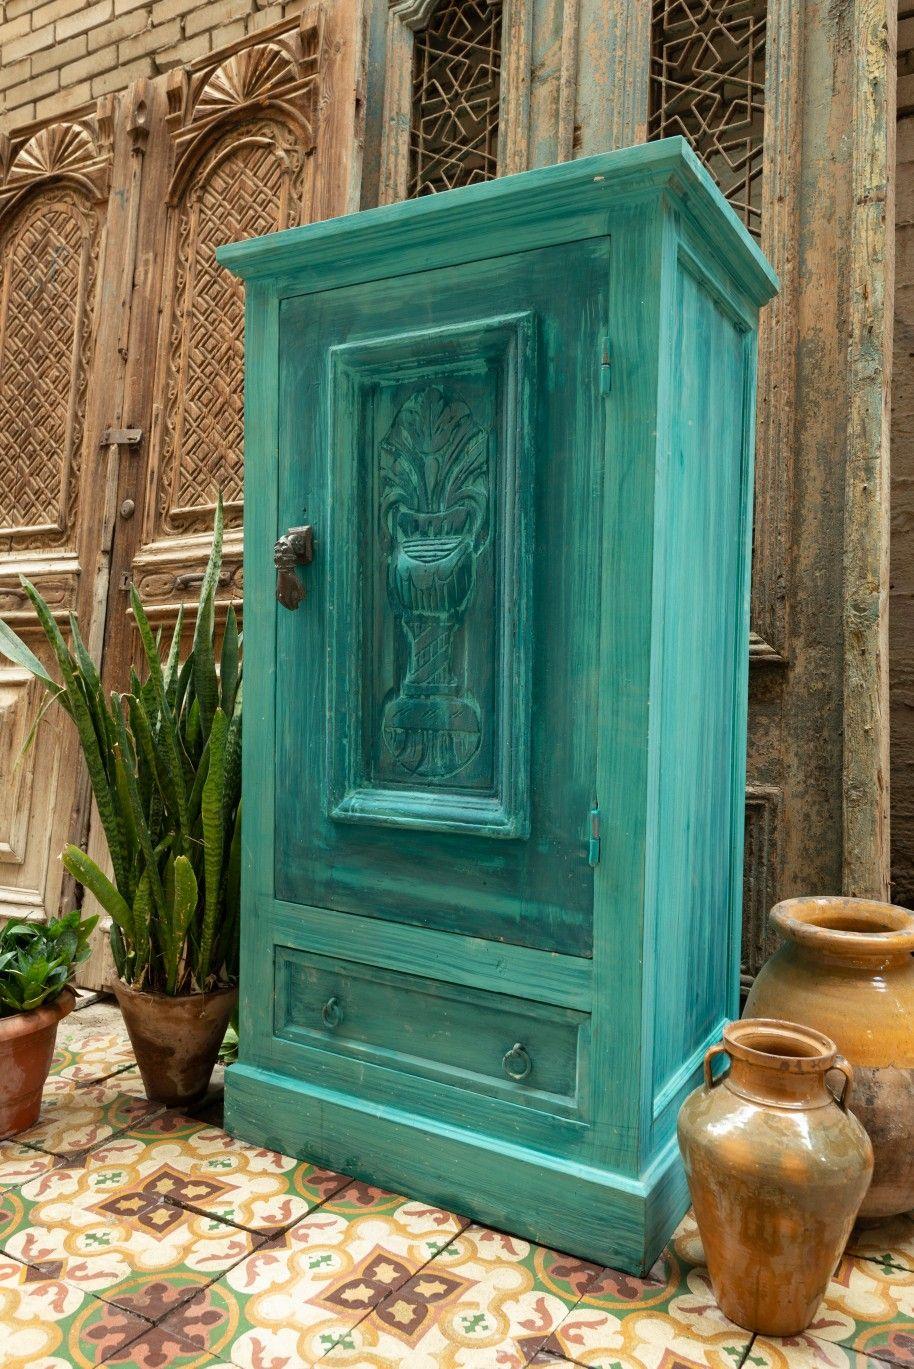 دولاب صغير باستخدام باب قديم Small Cabinet Using An Old Door Furniture Decor Home Decor